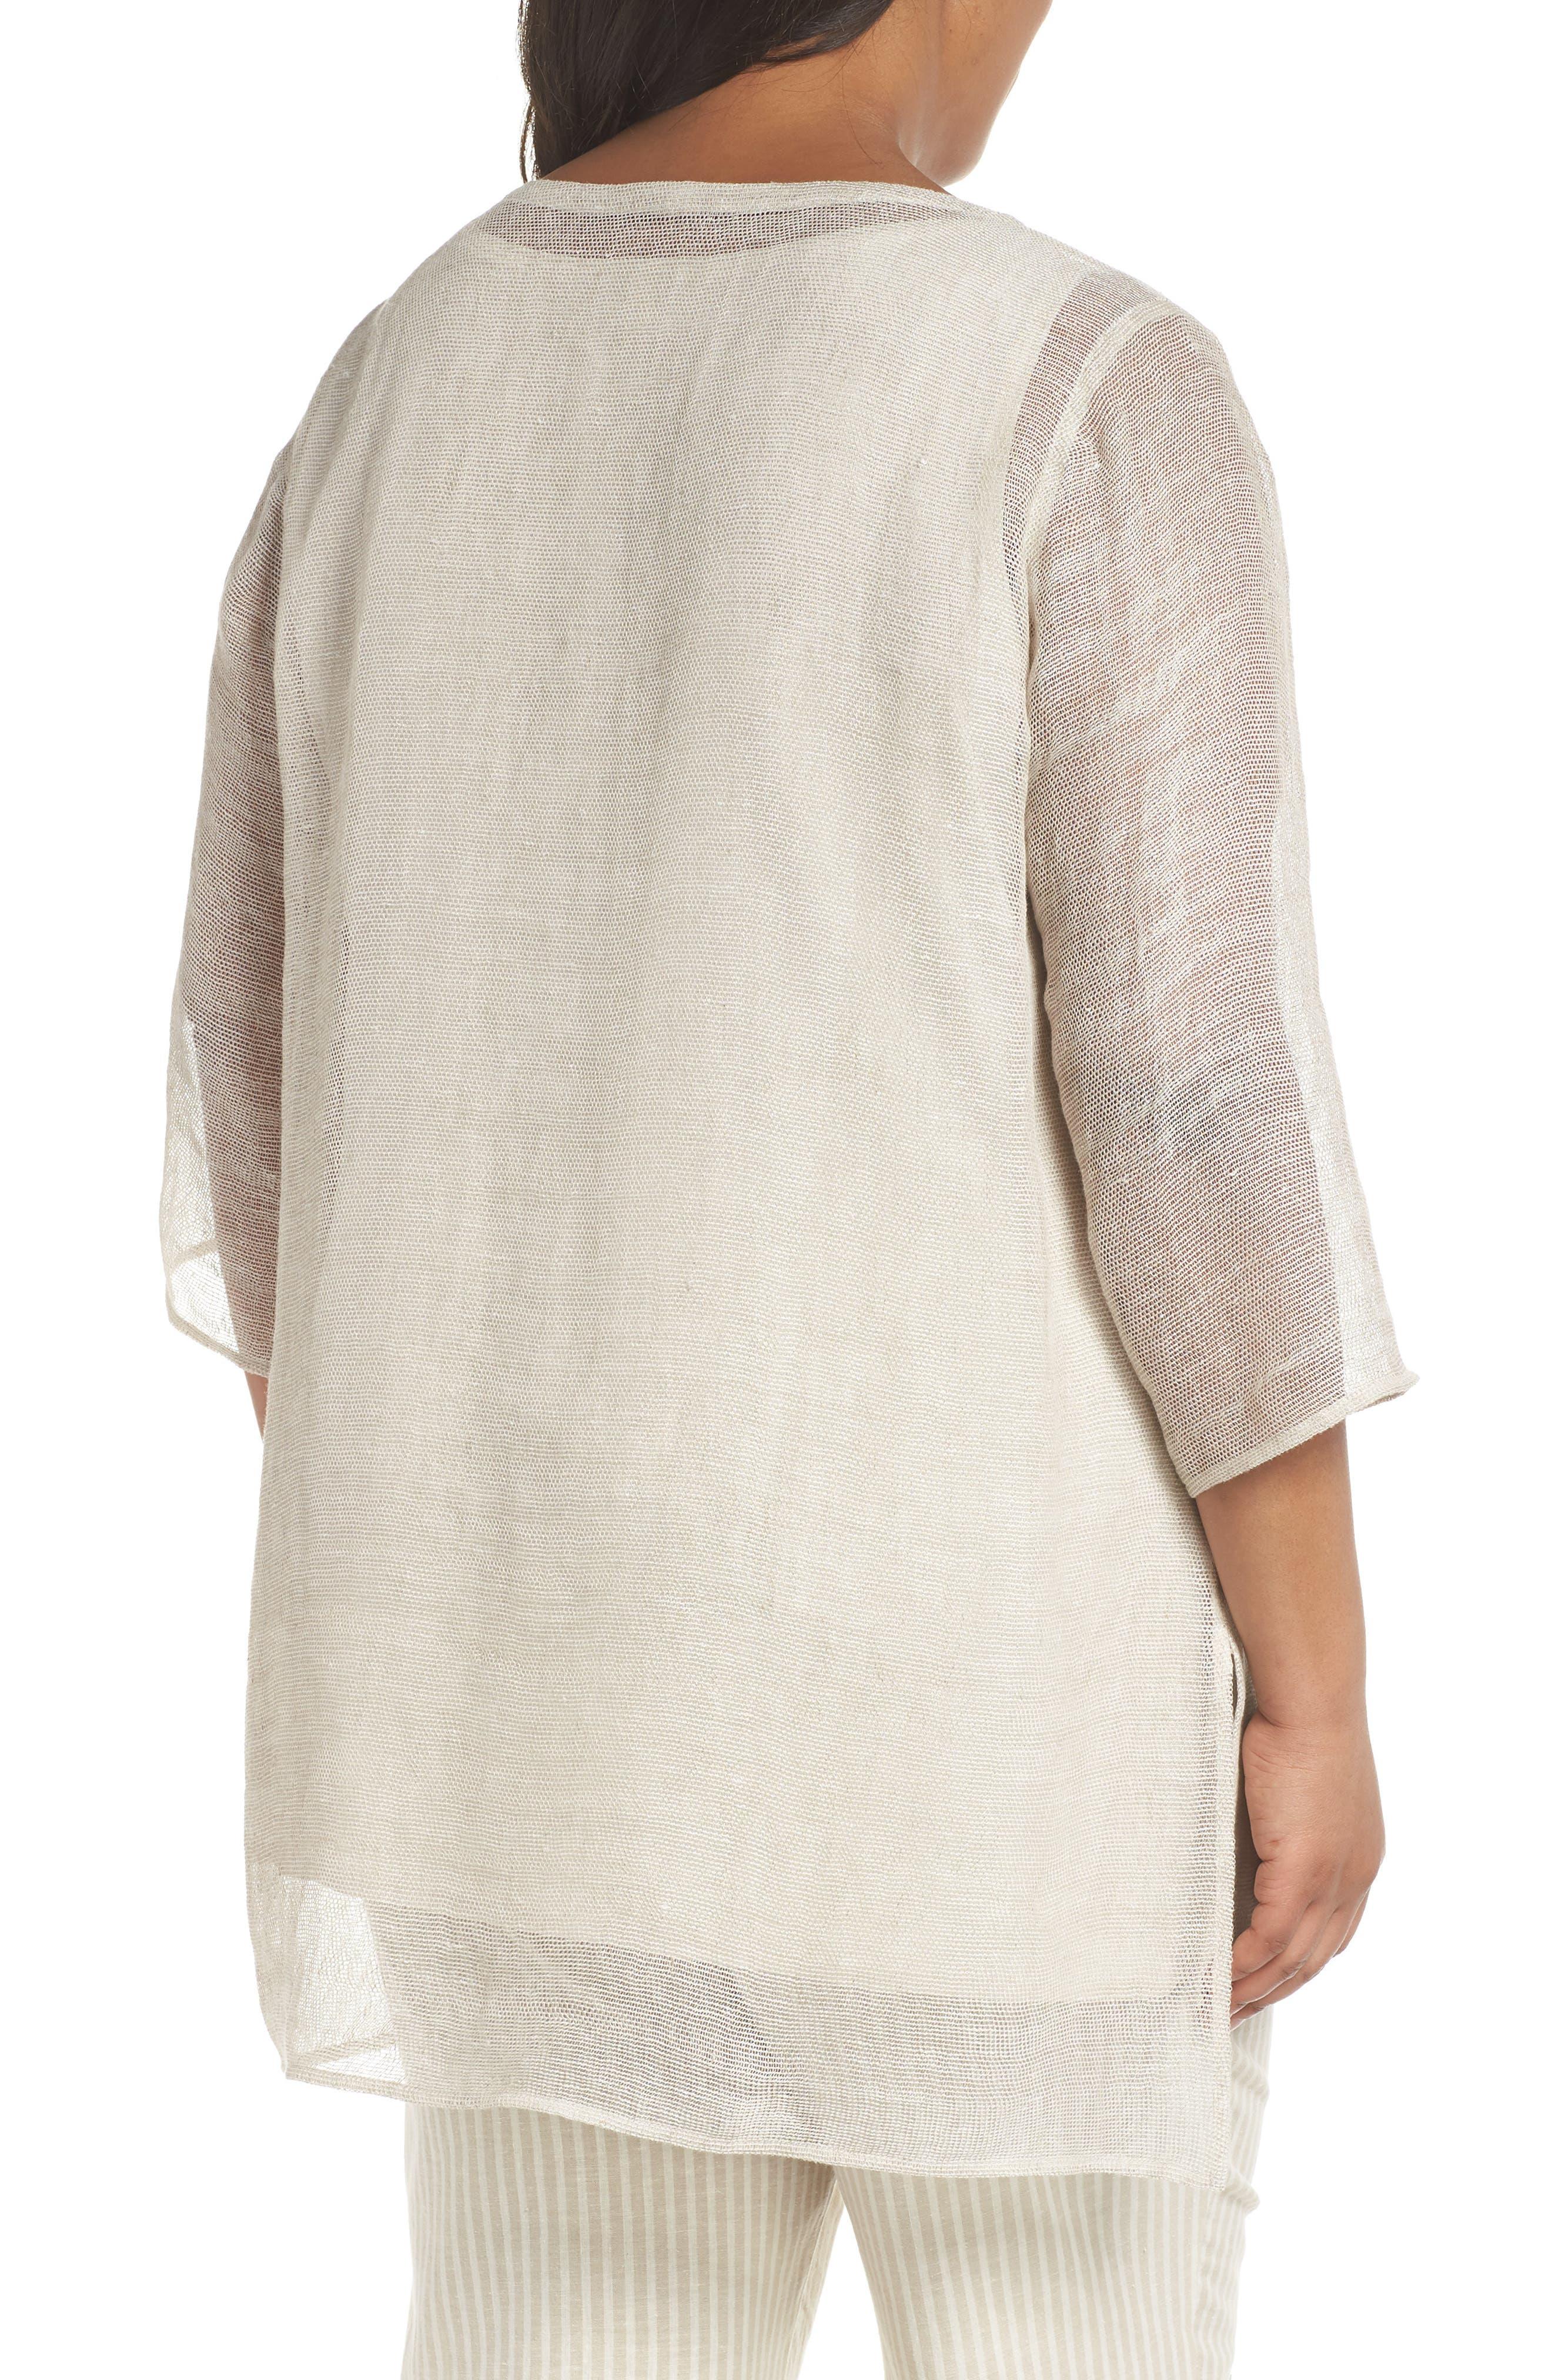 Organic Linen Mesh Tunic,                             Alternate thumbnail 2, color,                             Undyed Natural